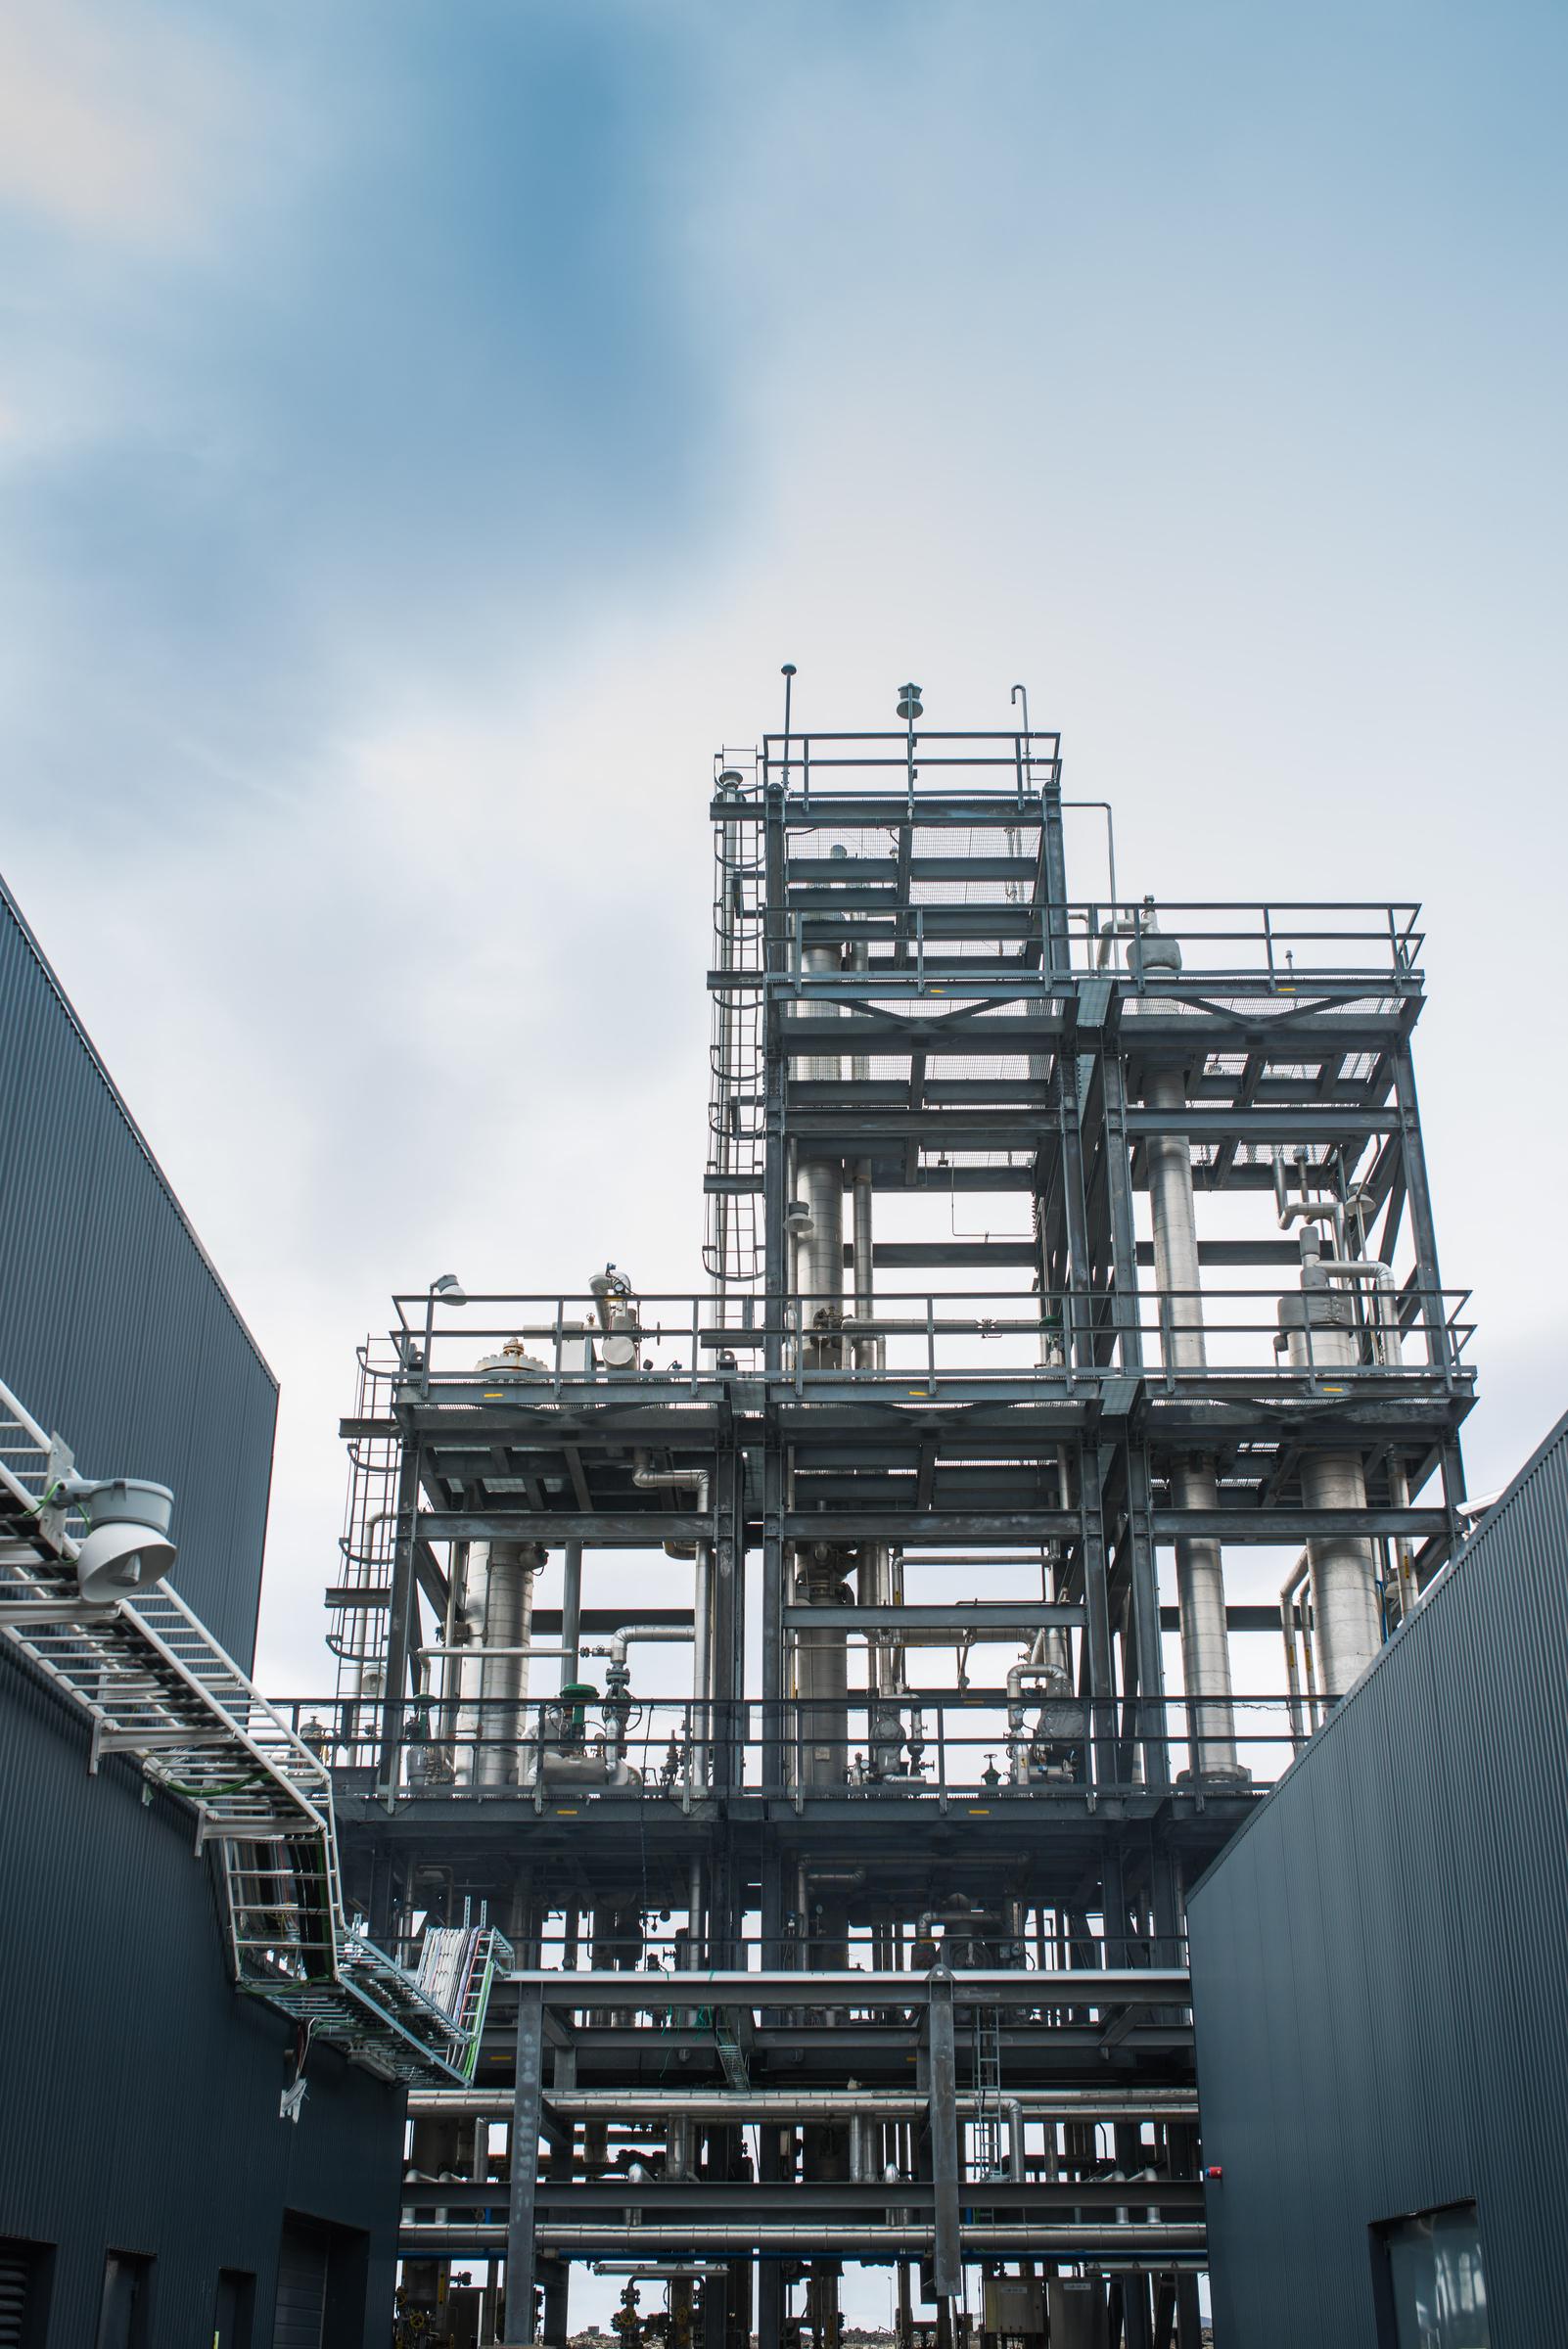 George Olah Renewable Methanol Plant